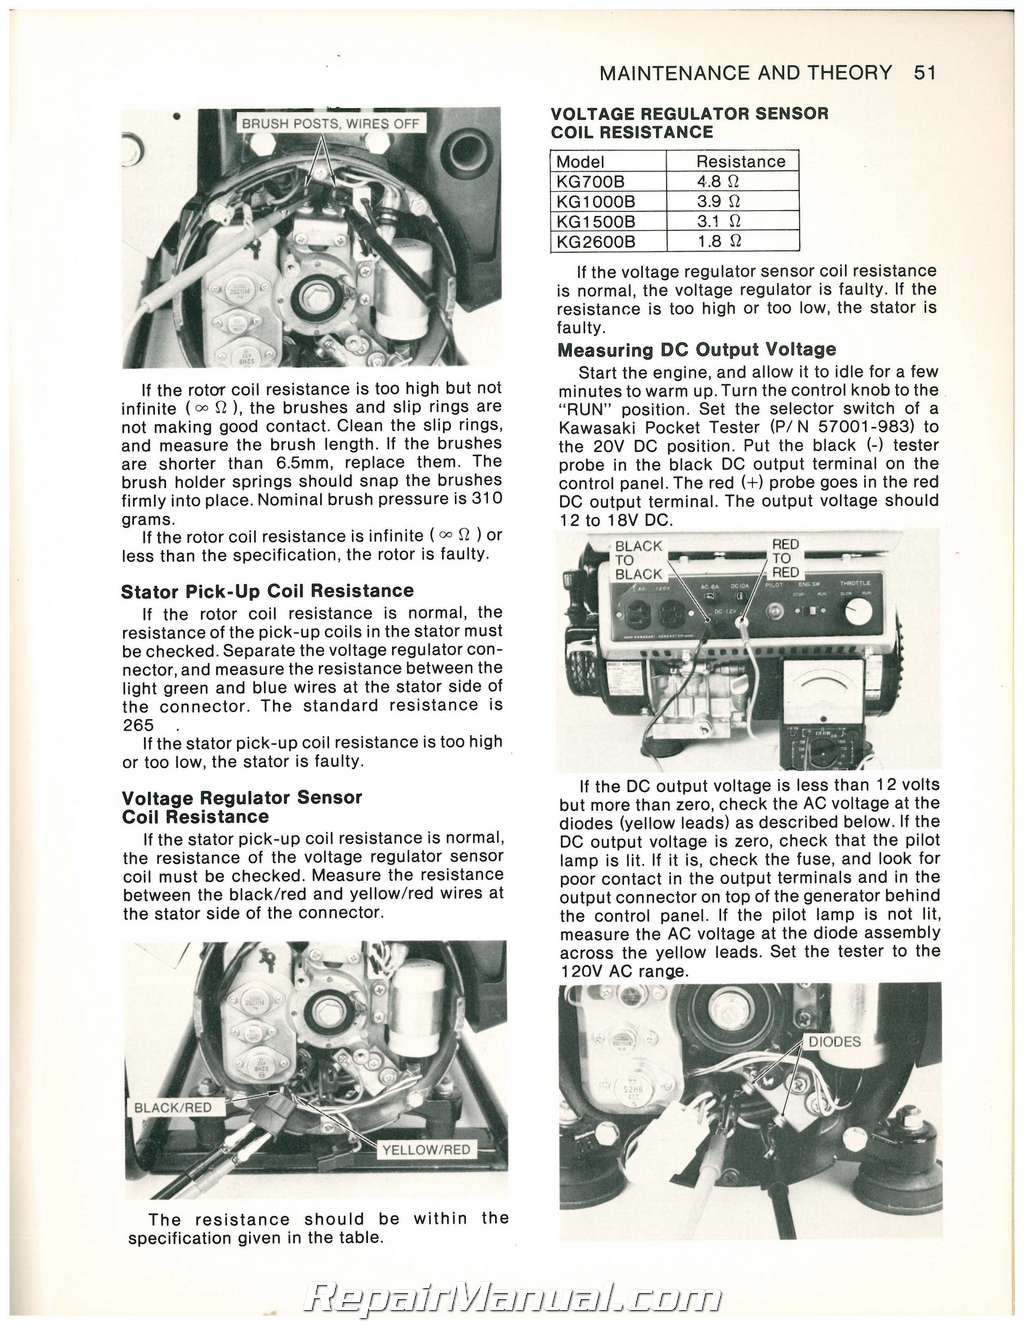 Kawasaki KG700B KG1500B KG1000B KG2600B Portable Generator Service Manual